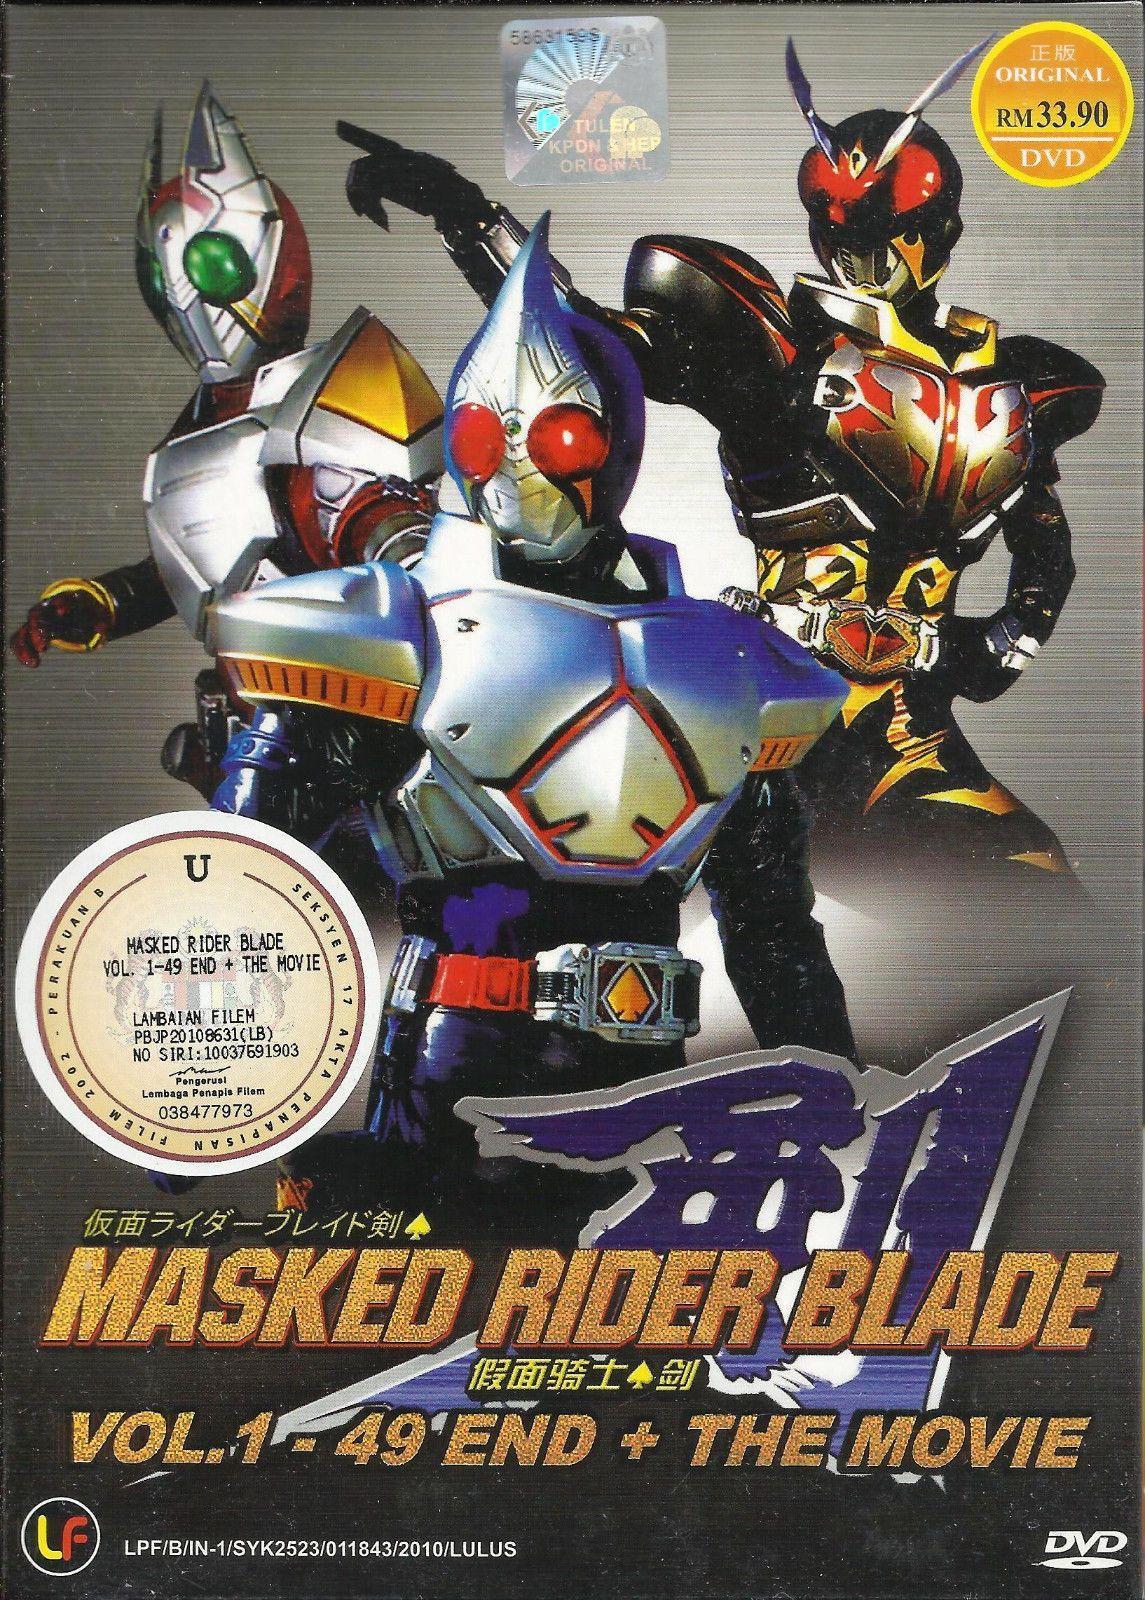 GEEK B-ROLL - Tokusatsu Review: Kamen Rider Blade (TV 1 - 49